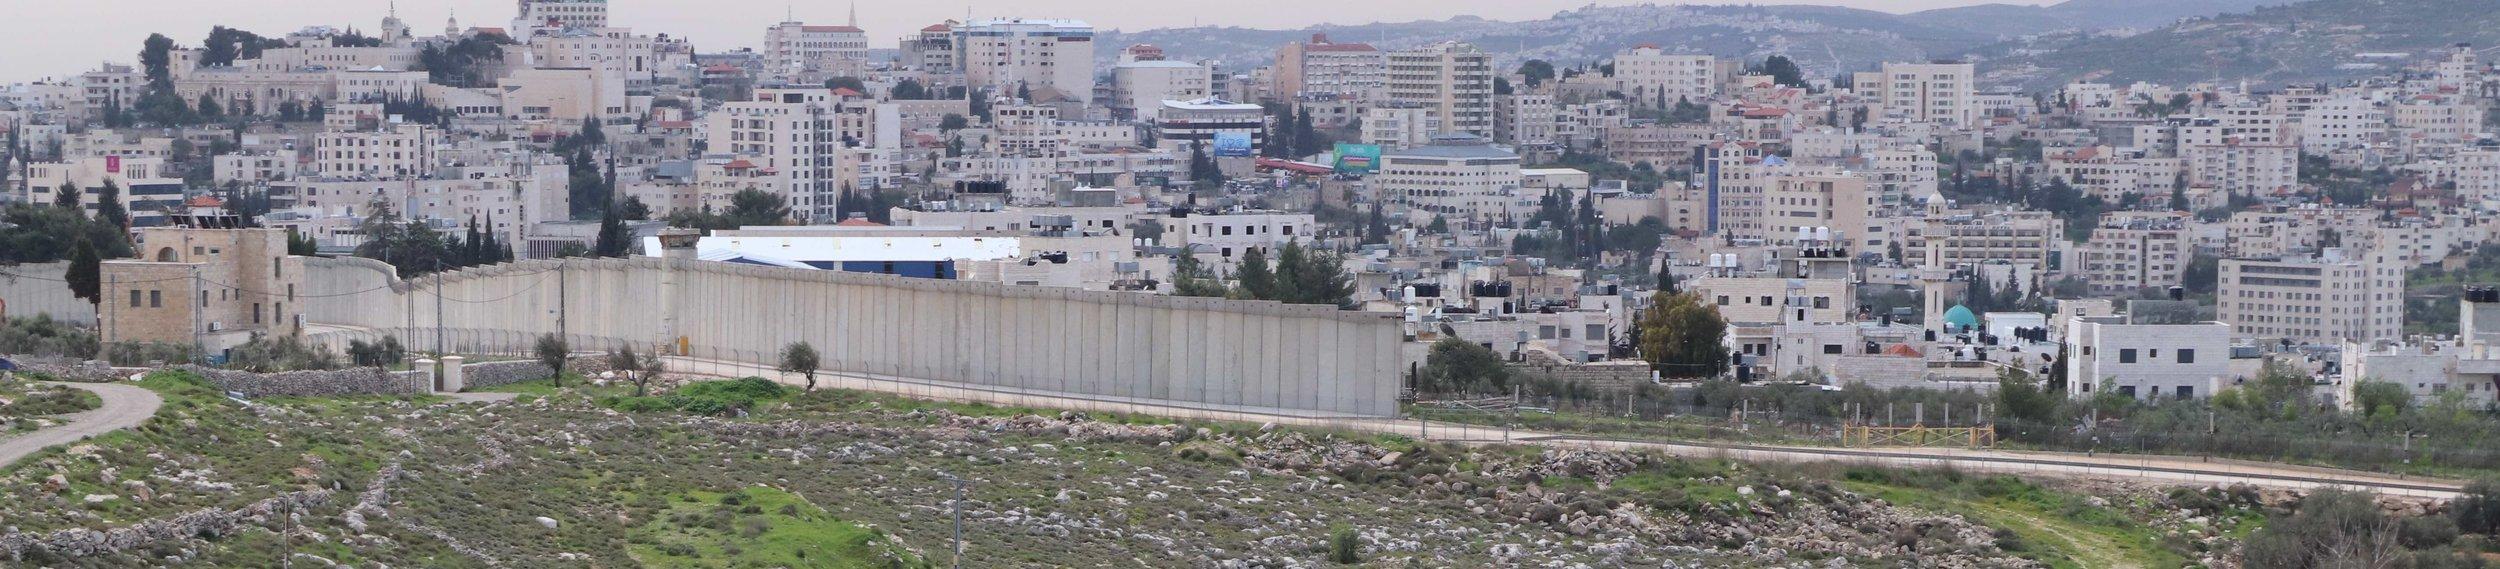 Barrier wall seen looking south from Jerusalem towards Bethlehem